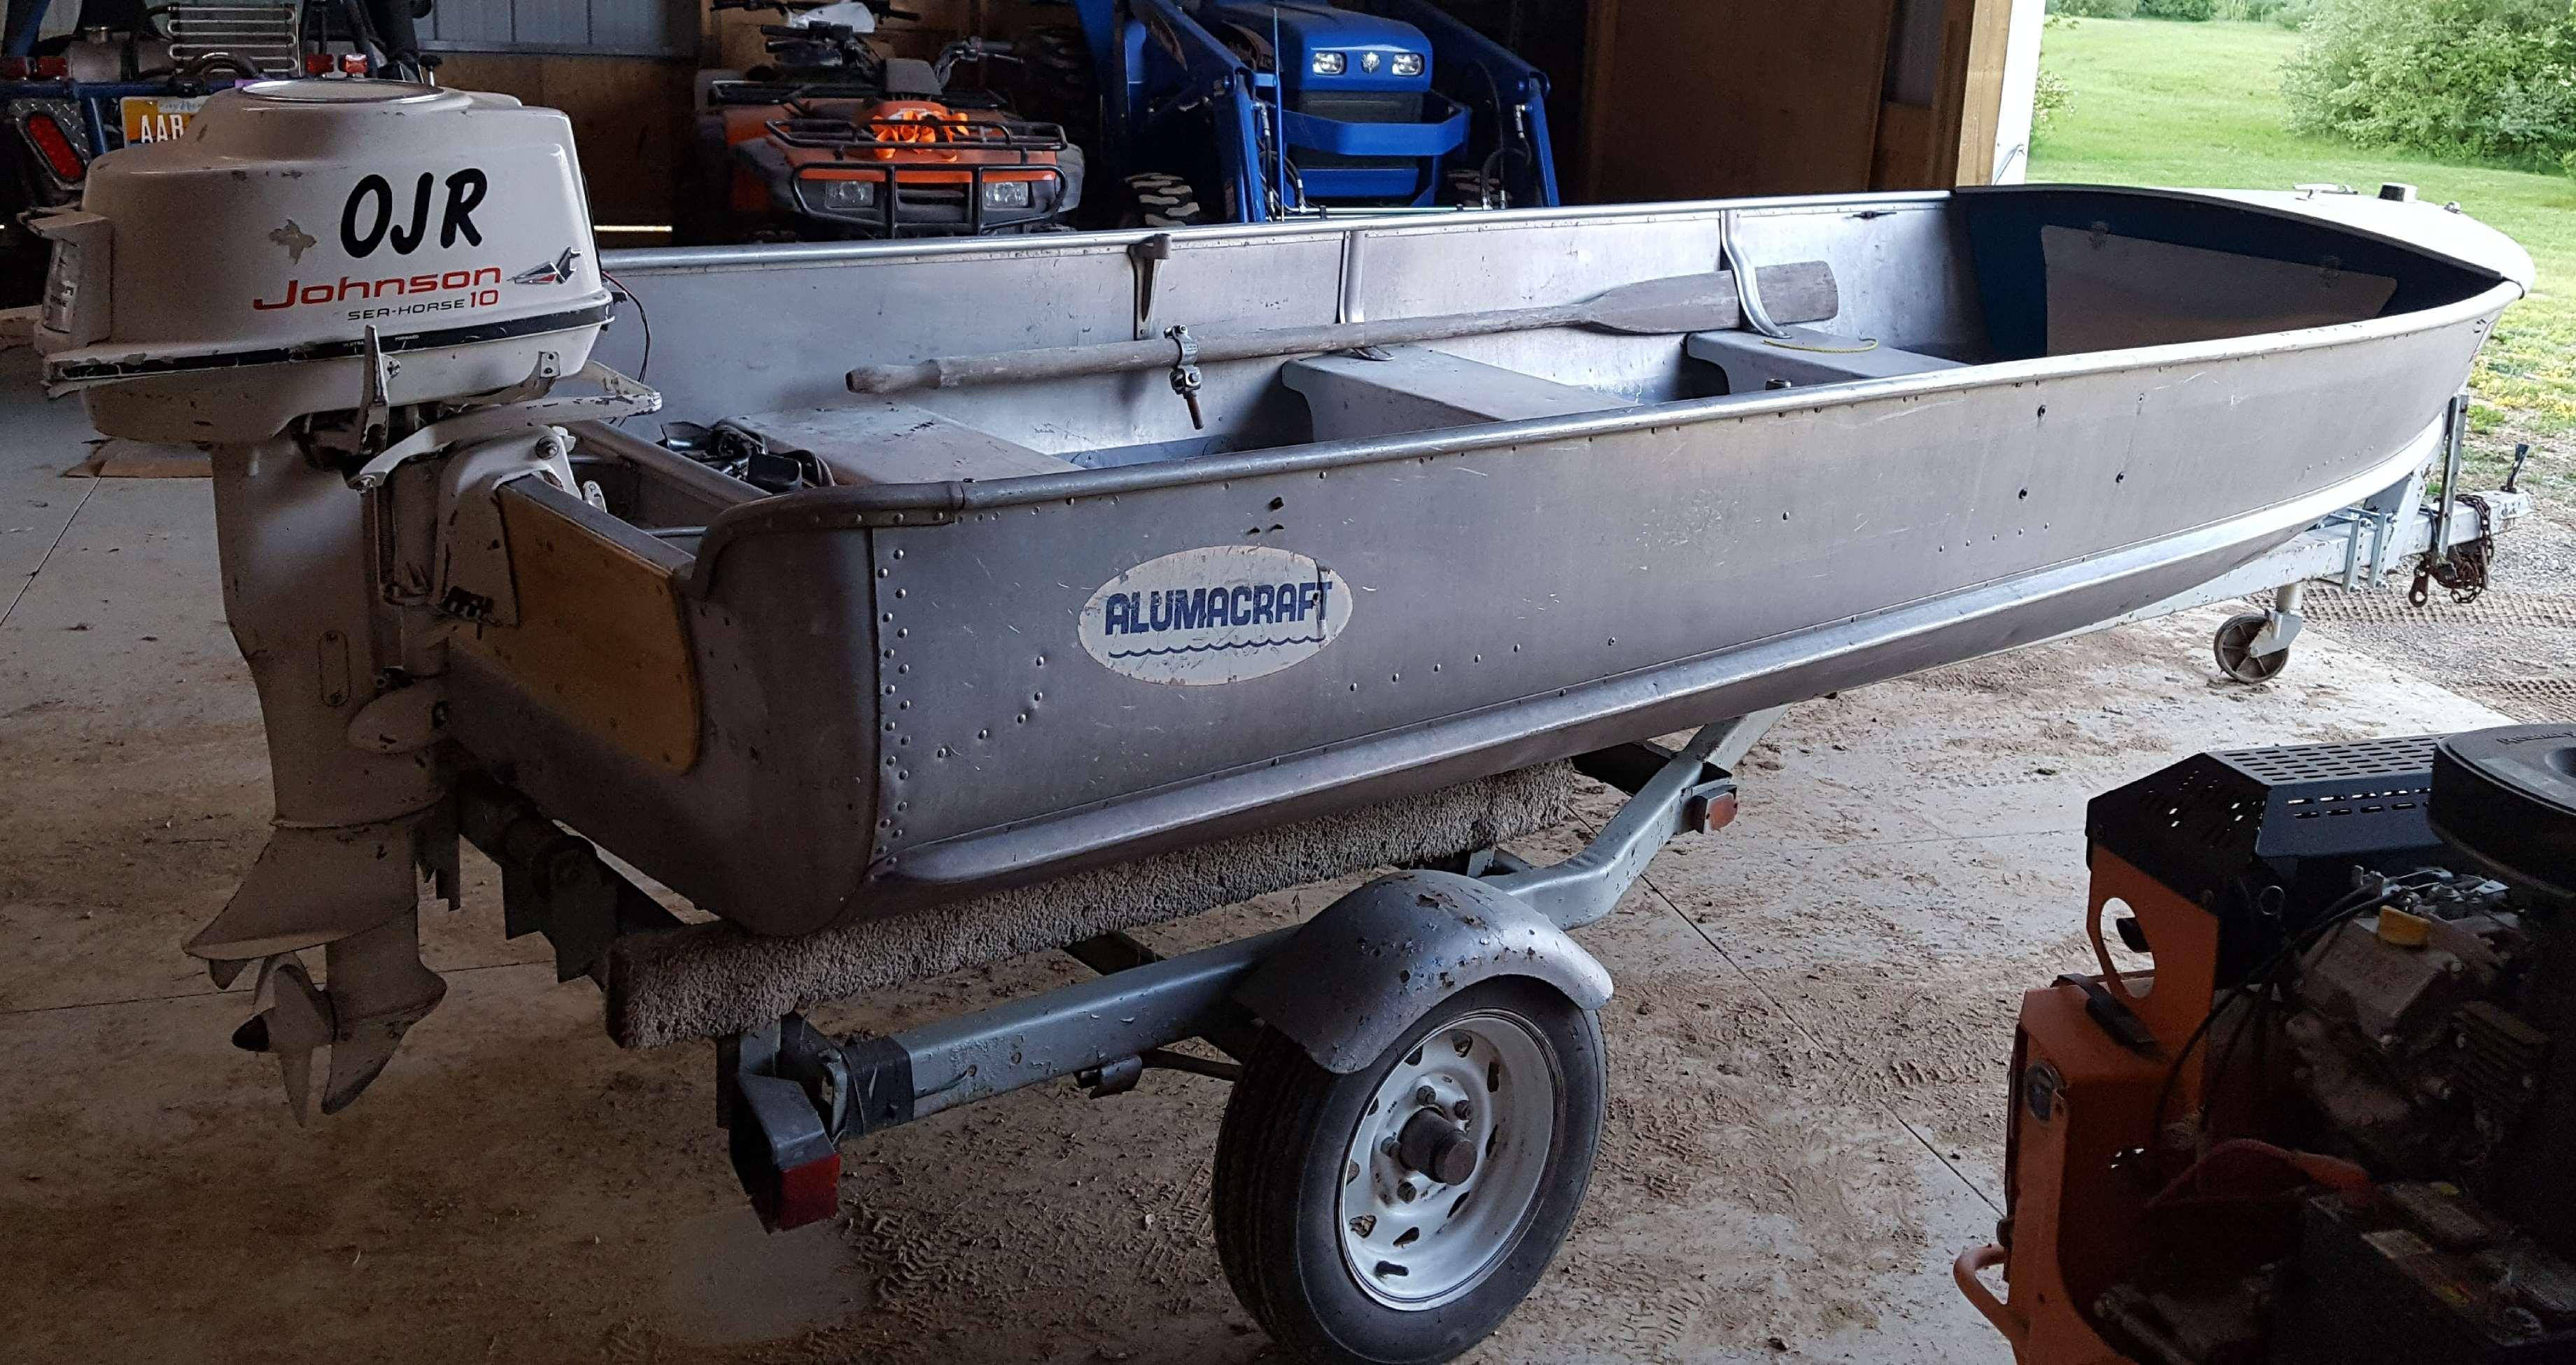 Alumacraft – Antique Outboard Motor Club,Inc